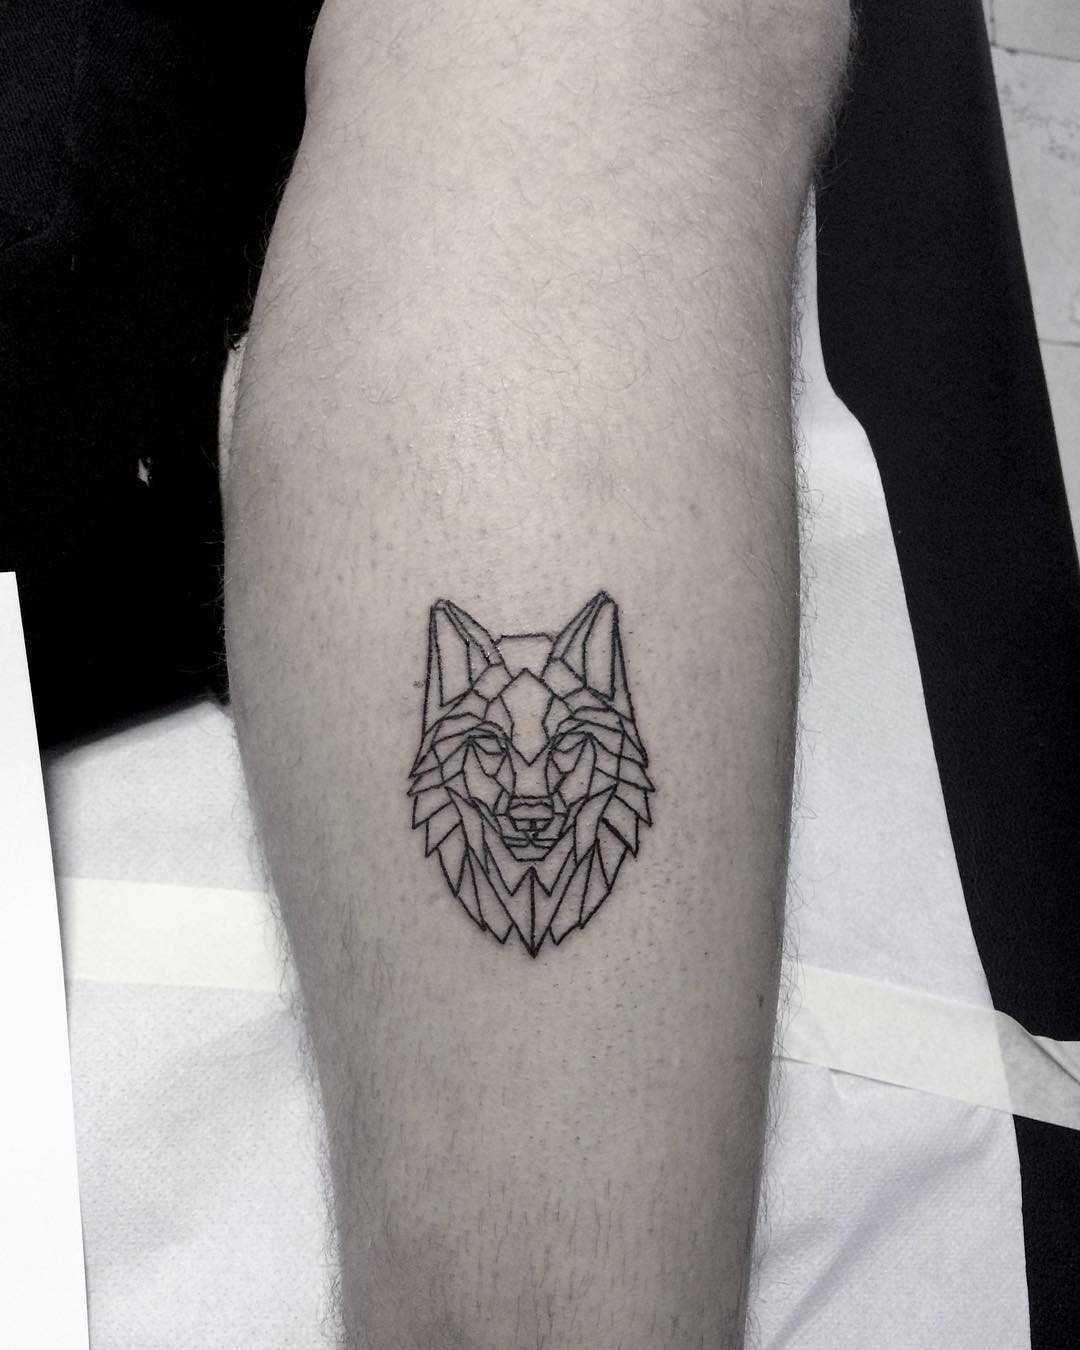 Geometric Wolf Head Tattoo On The Calf Geometric Wolf Head Tattoo On The Calf Angeltattoo Be In 2020 Wolf Tattoo Design Geometrischer Wolf Tattoo Tatowierungen